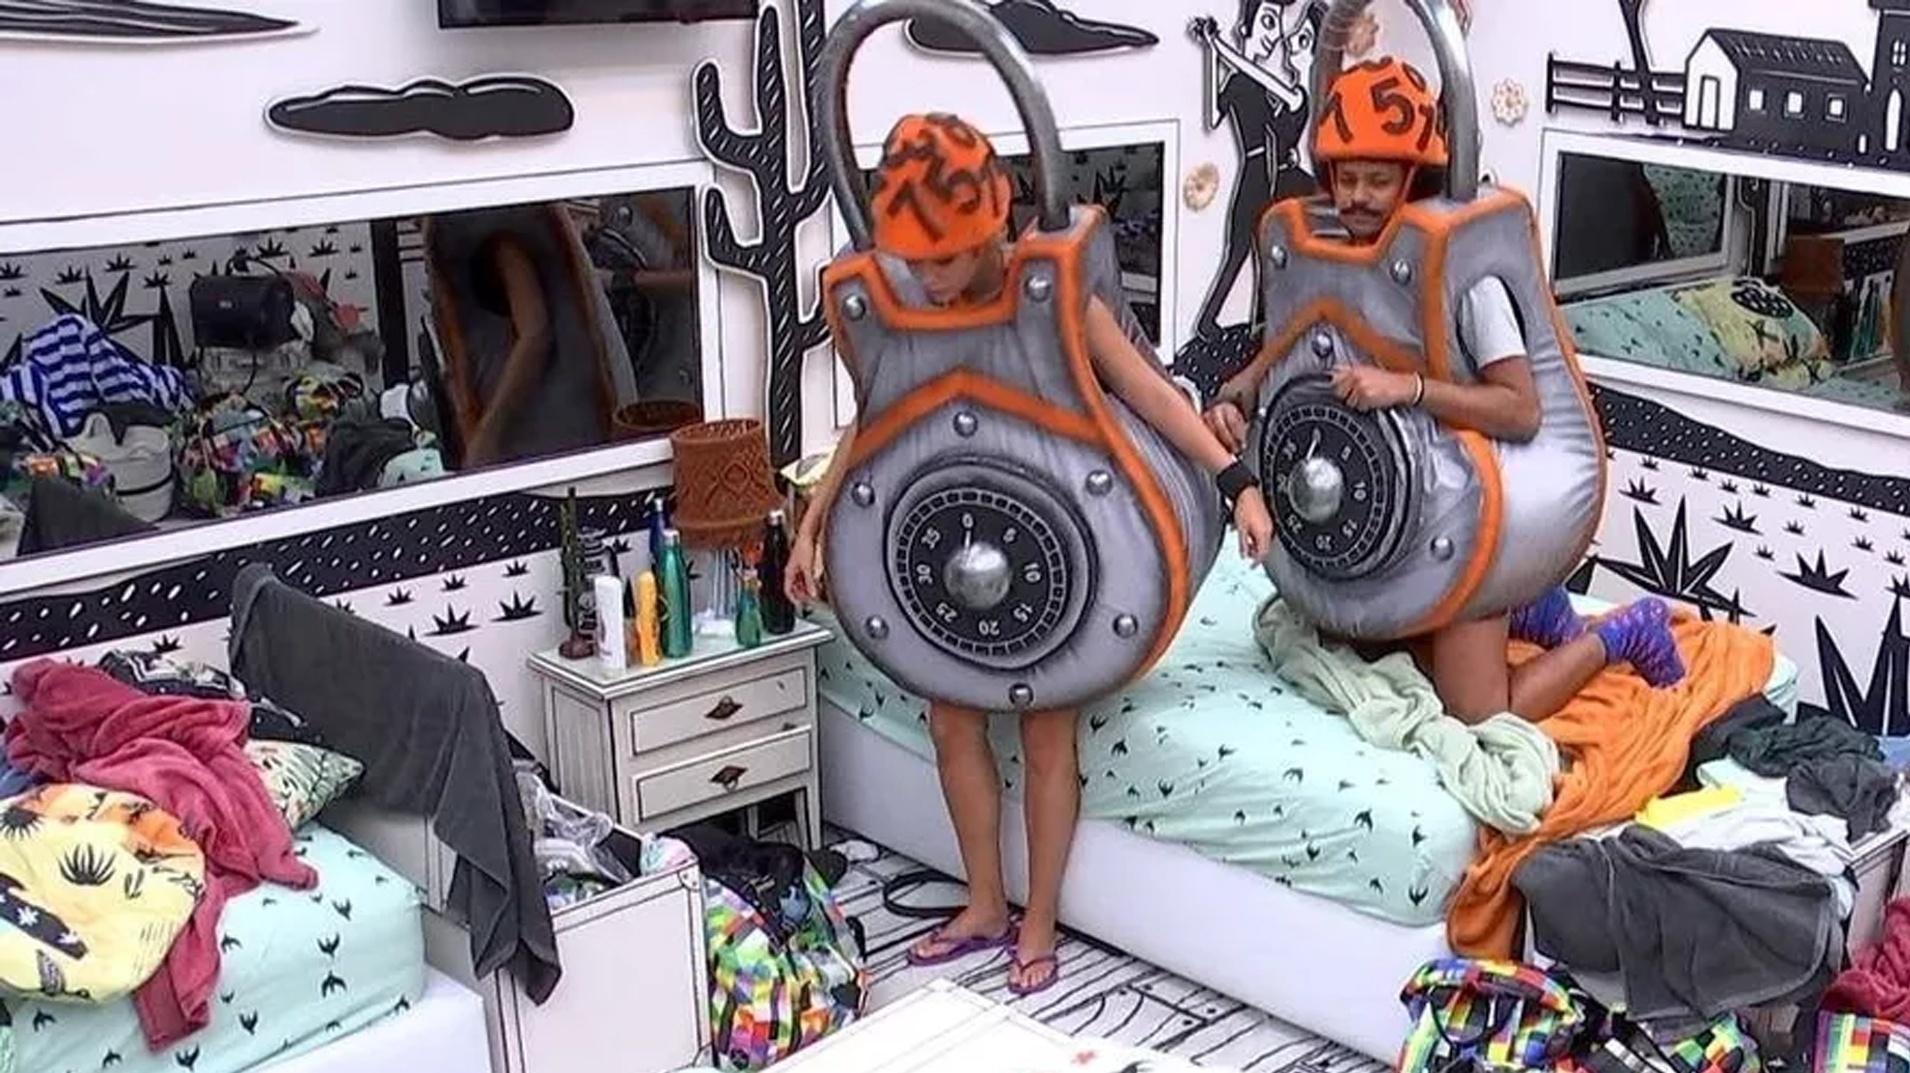 BBB 21: Sarah & Joao Fulfill Monster Punishment - Breed / Globoplay